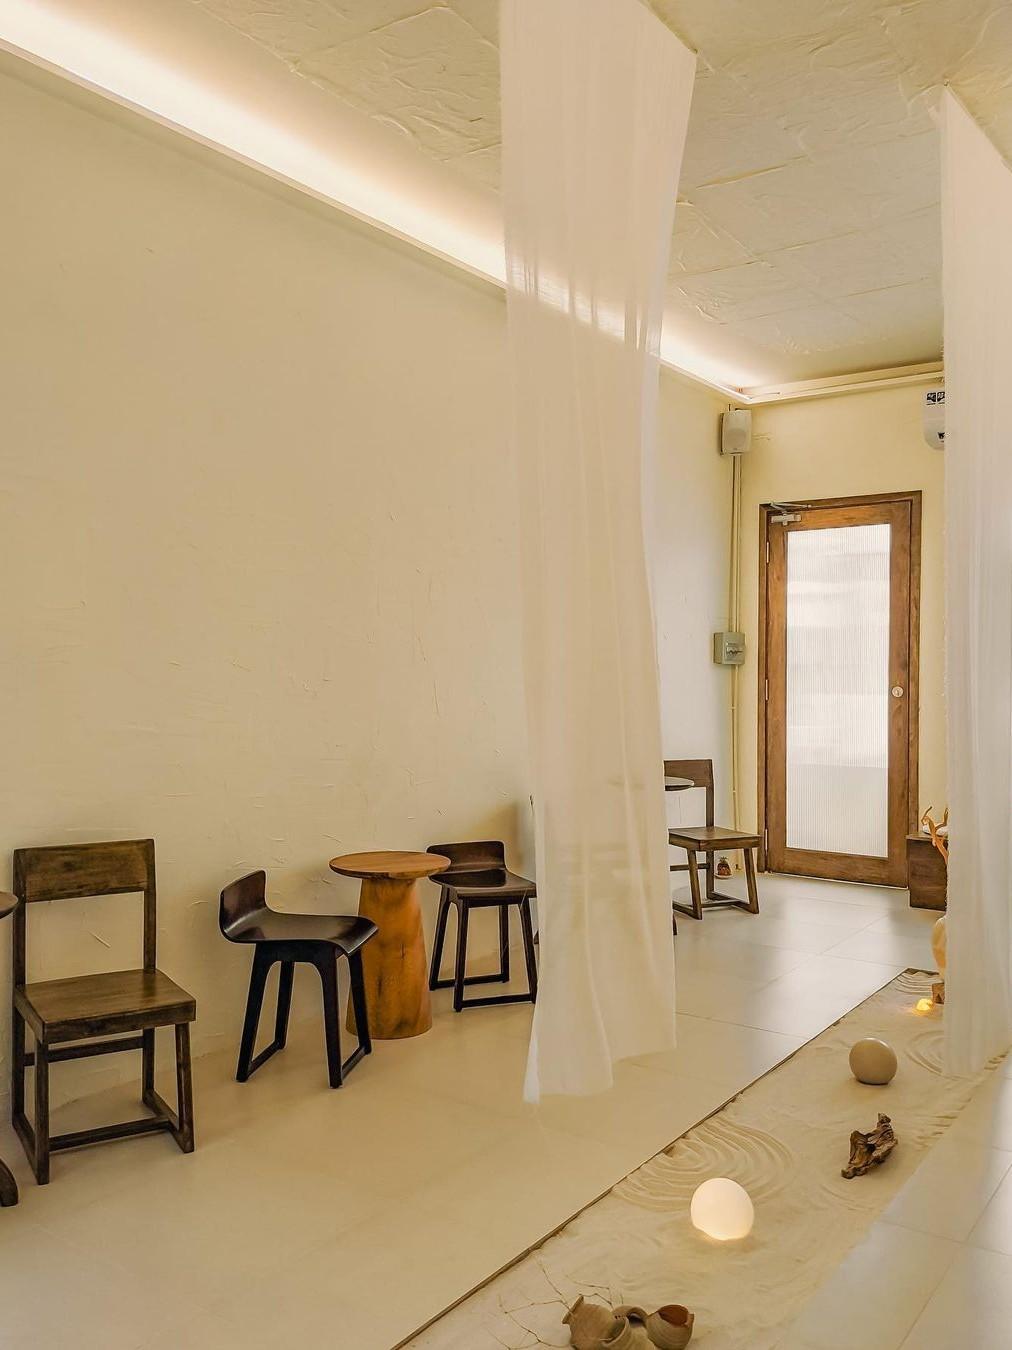 Gia Room Cafe